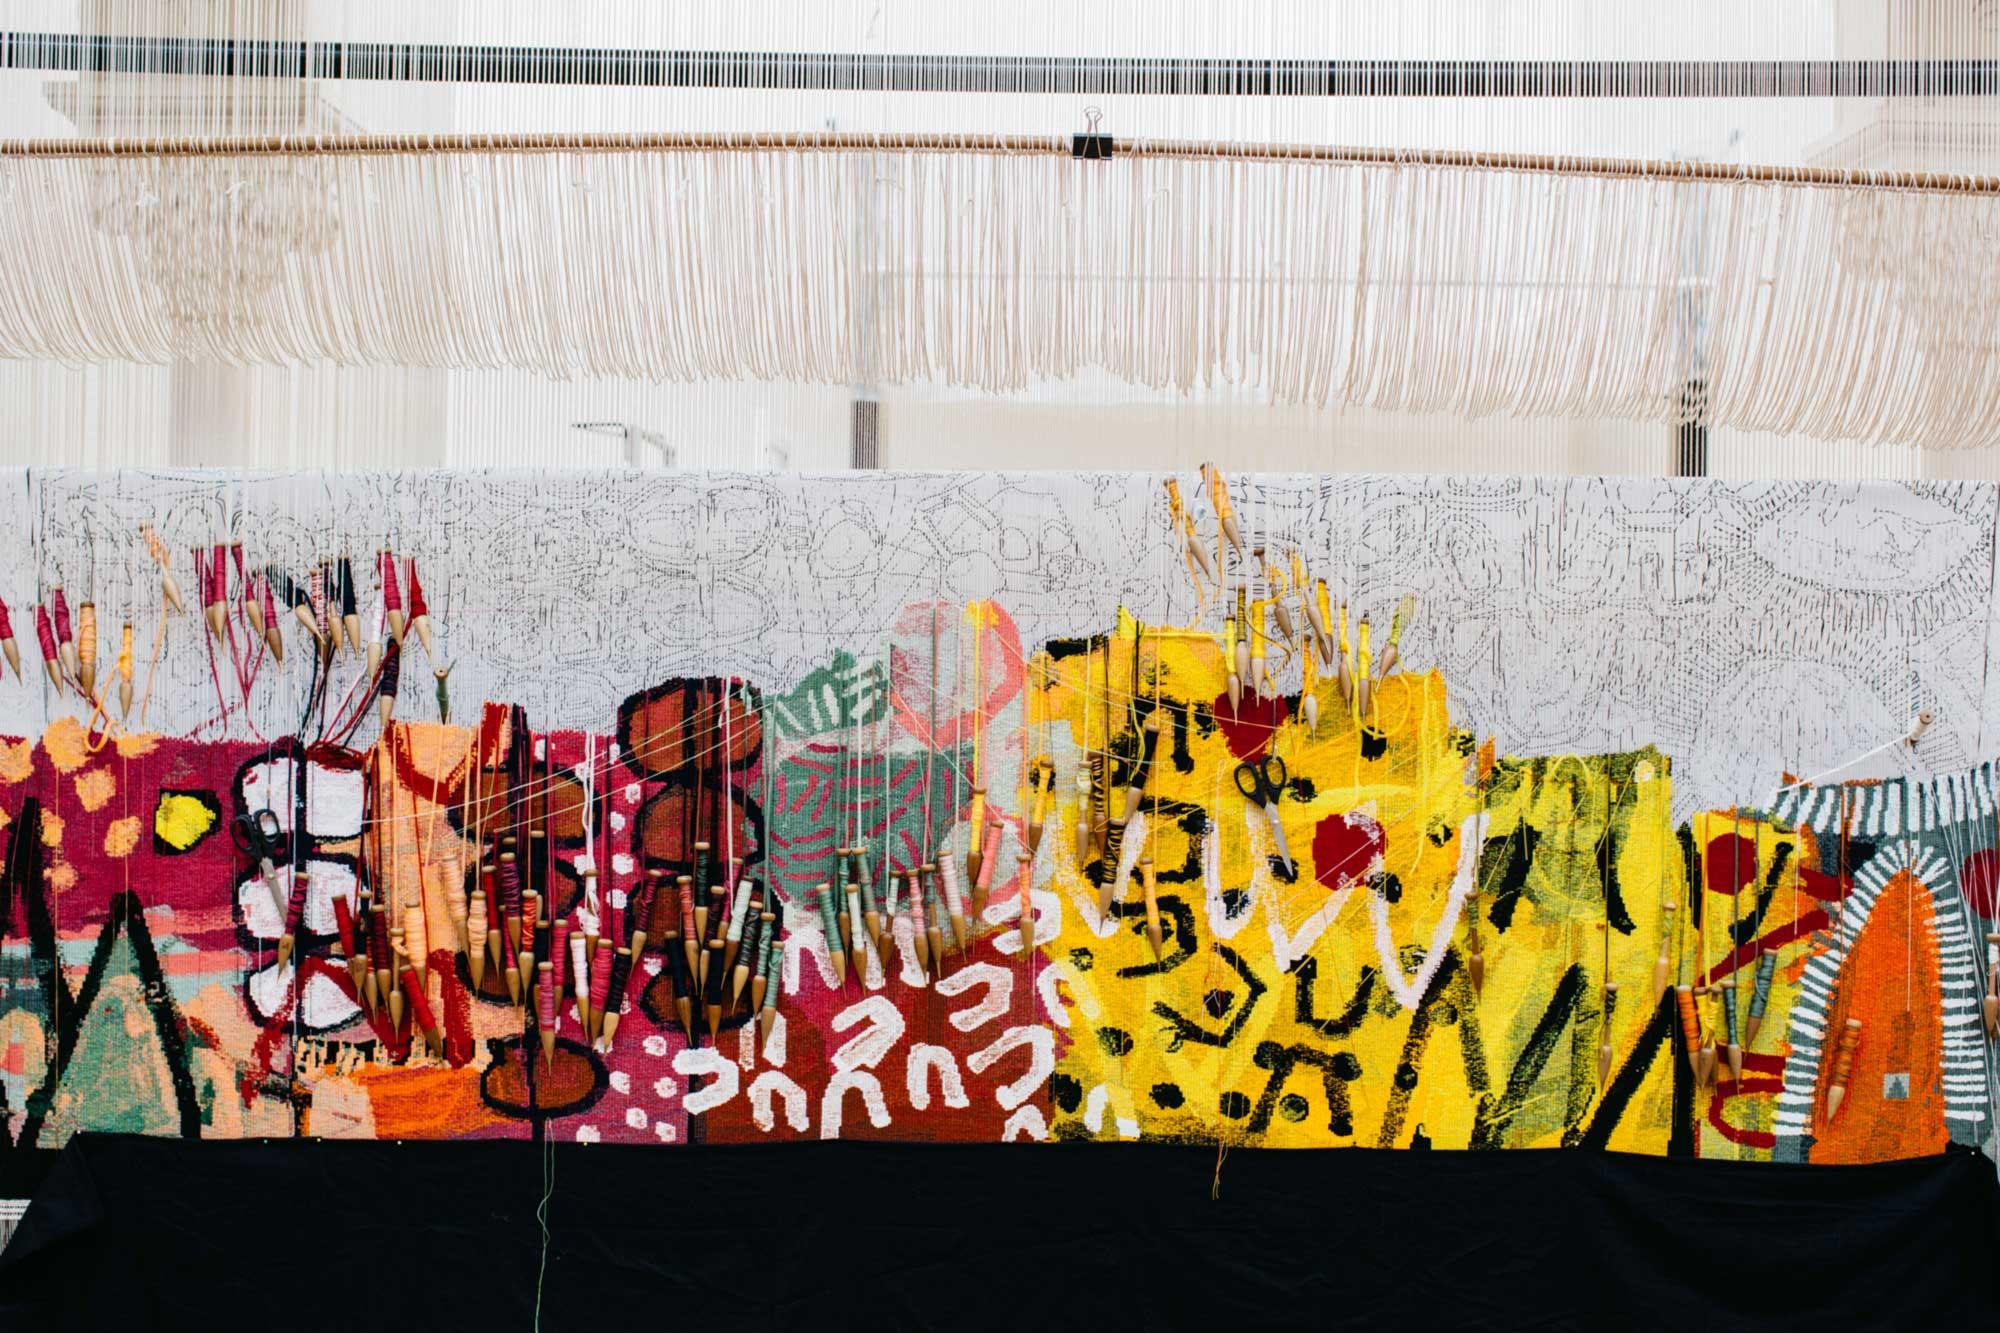 On the loom: 'The Royal Harvest' tapestry in progress, designed by Naomi Hobson and woven by Pamela Joyce, Sue Batten, Tim Gresham & Jennifer Sharpe. Photo: Marie-Luise Skibbe.